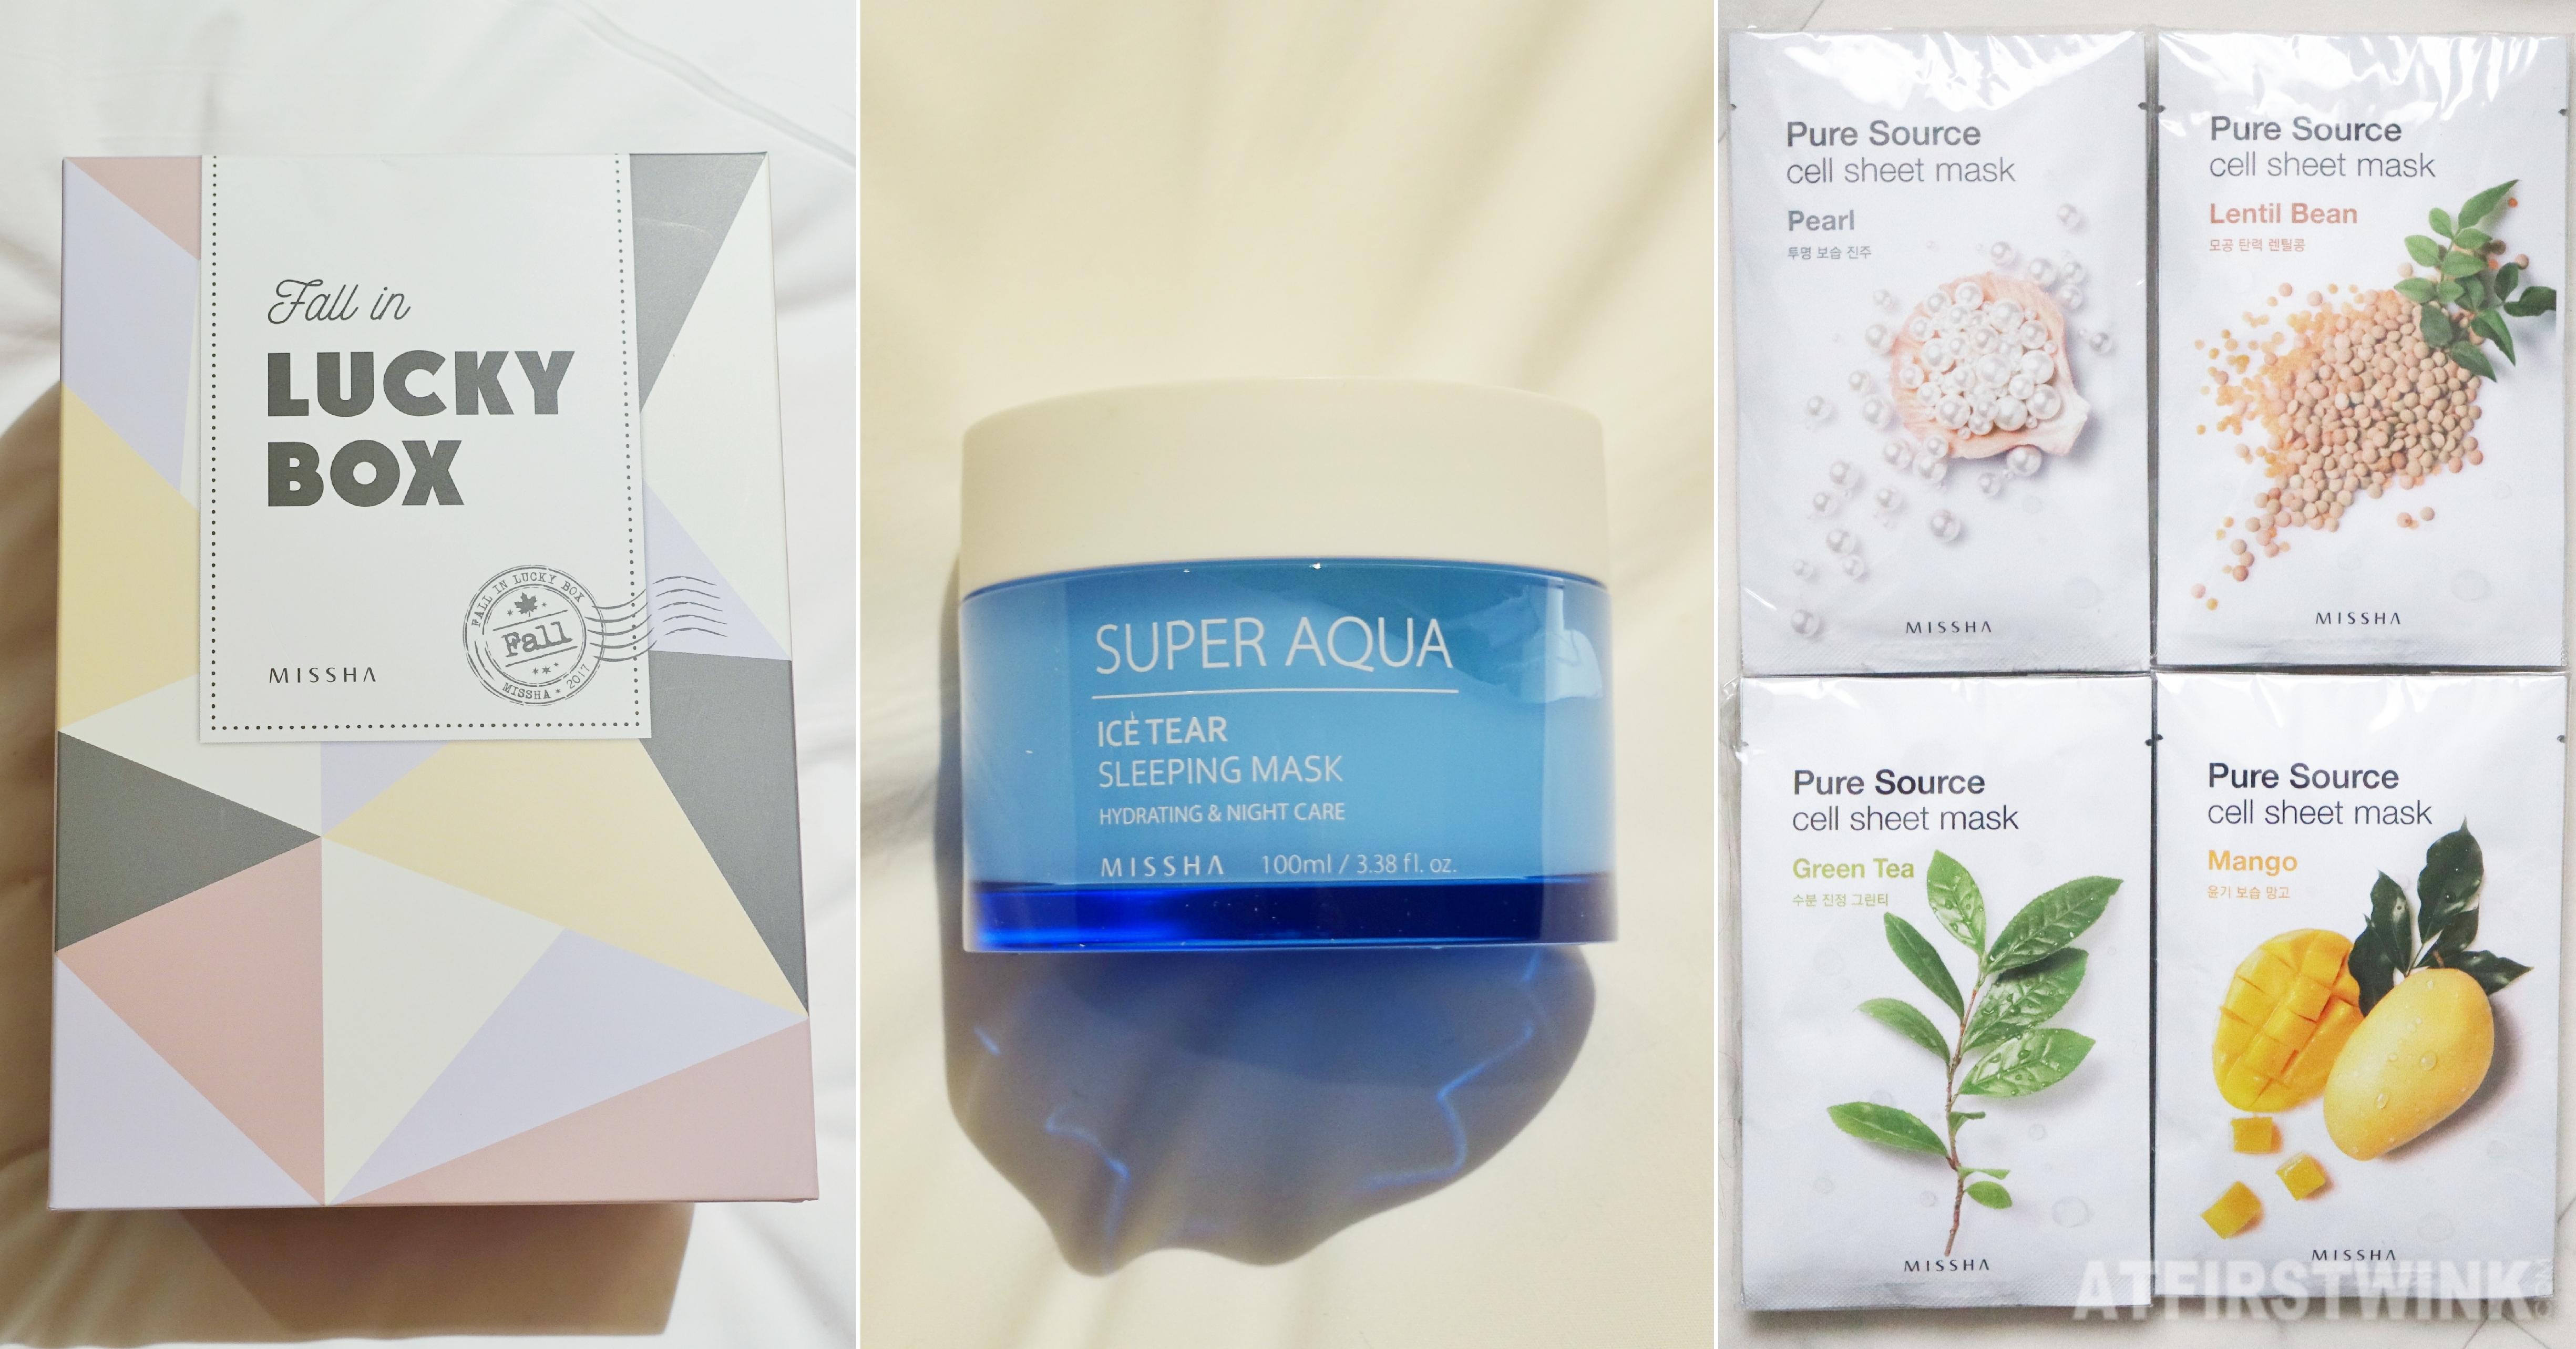 Missha fall in lucky box cream pure source sheet masks